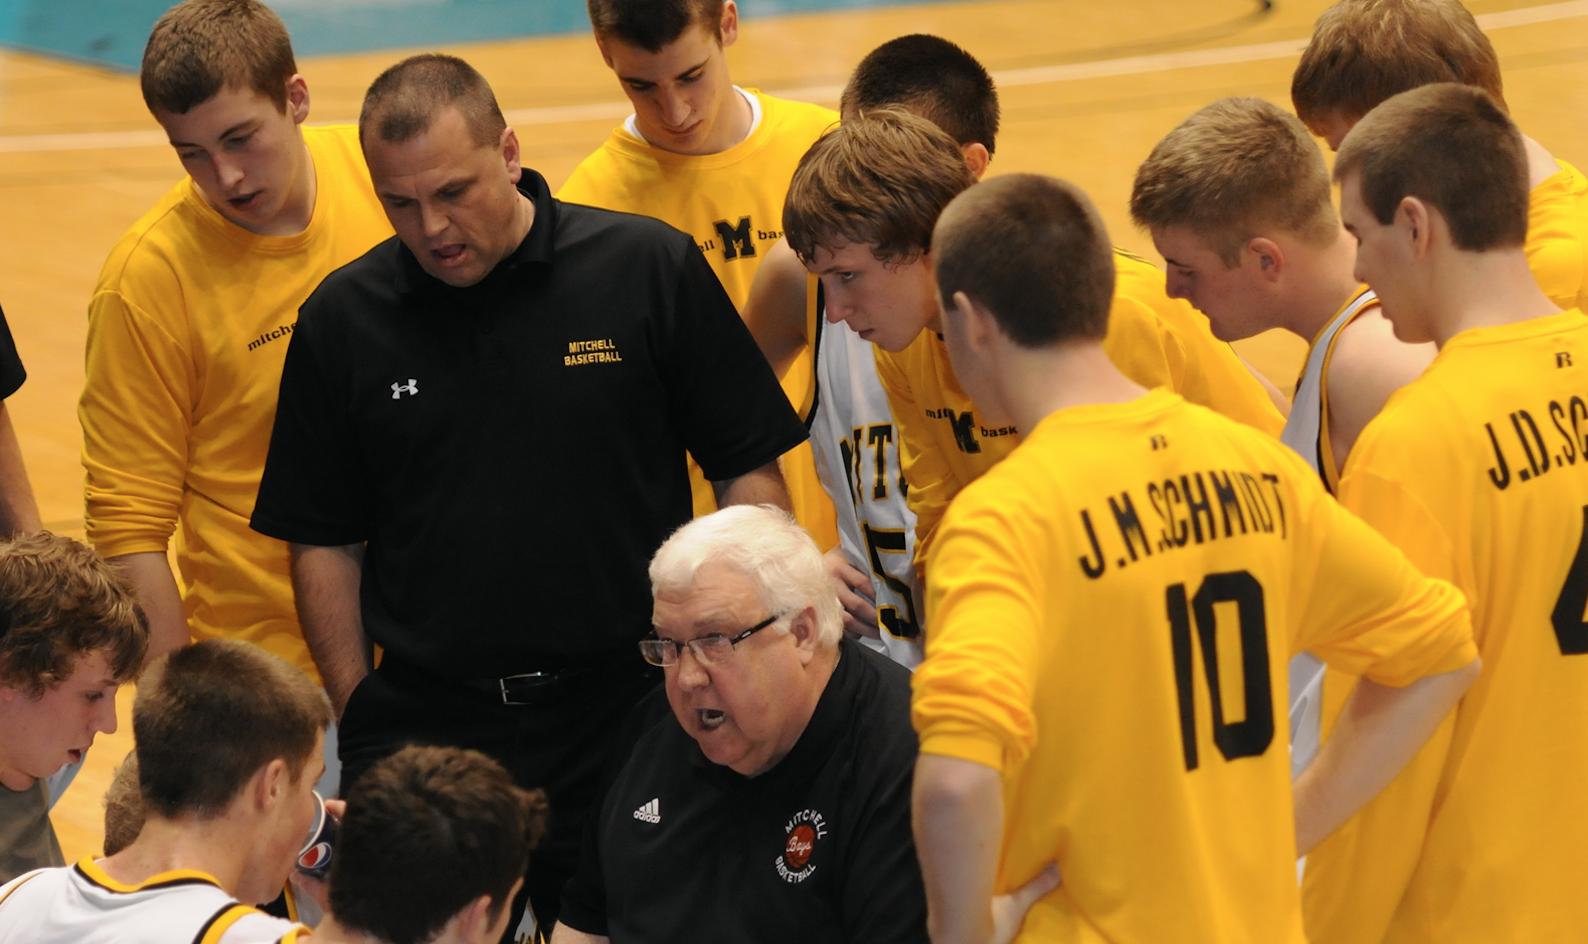 Mitchell basketball coach